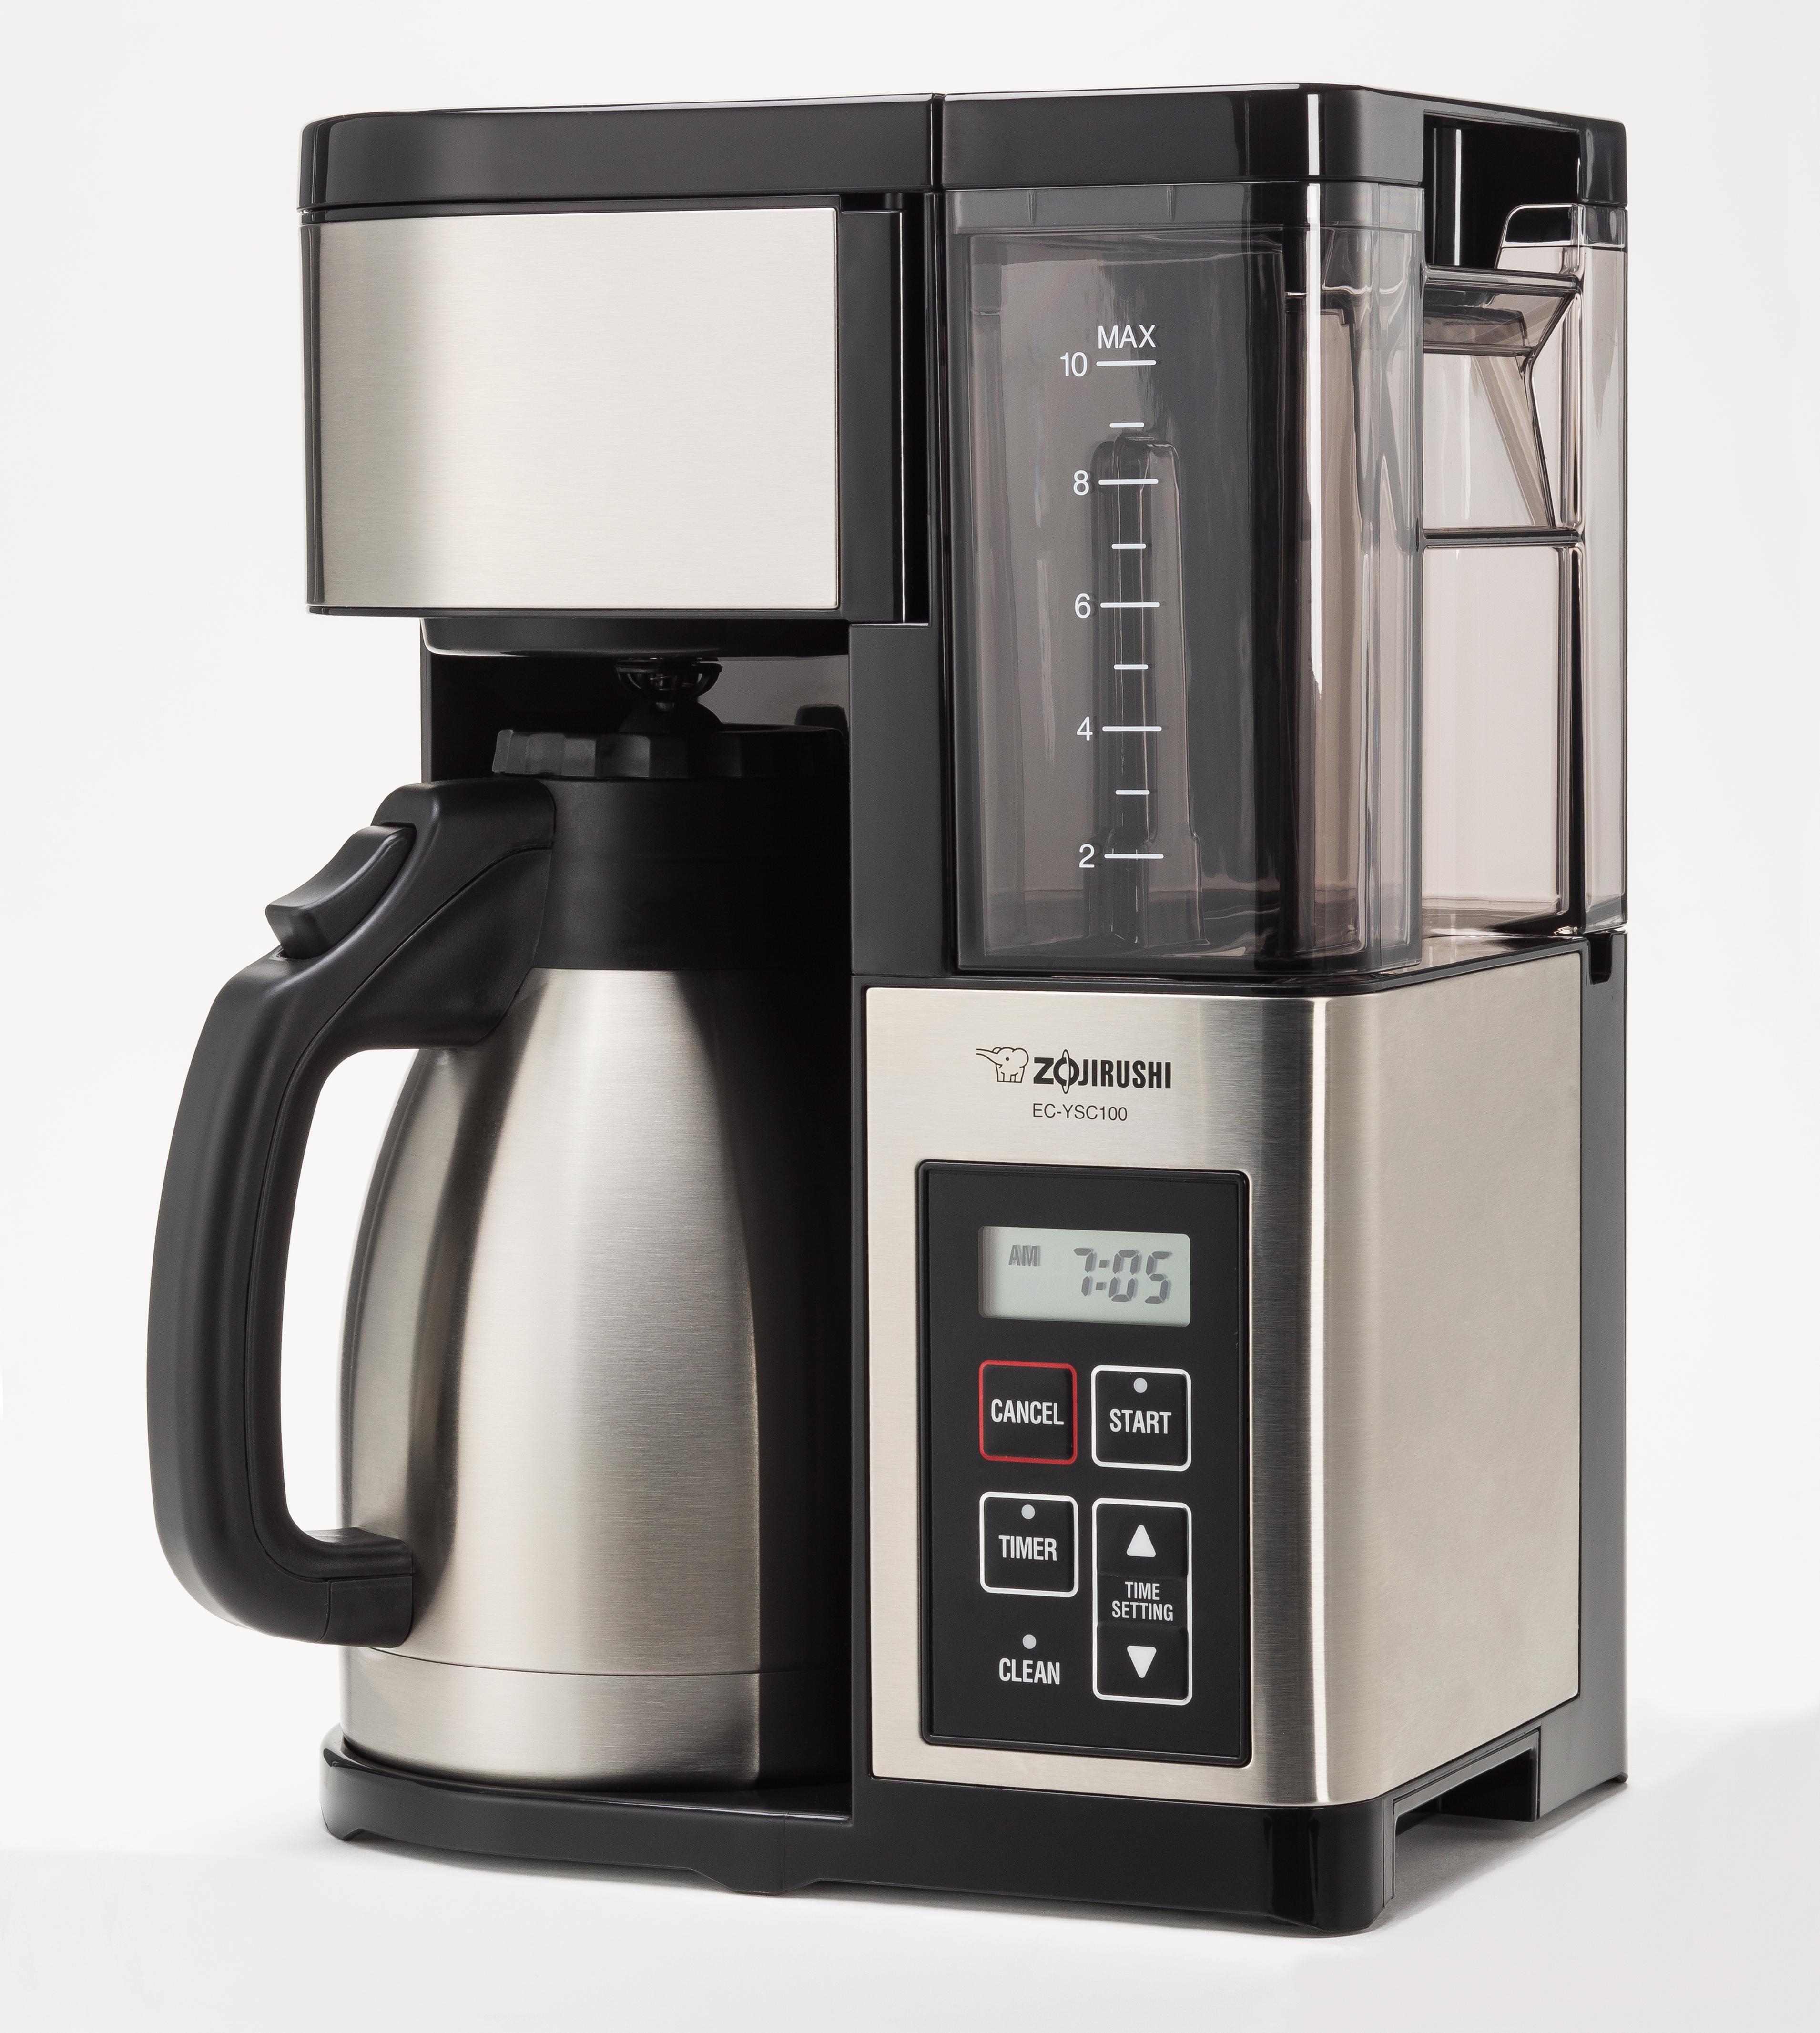 File Consumer Reports Zojirushi coffeemaker1 Wikimedia mons